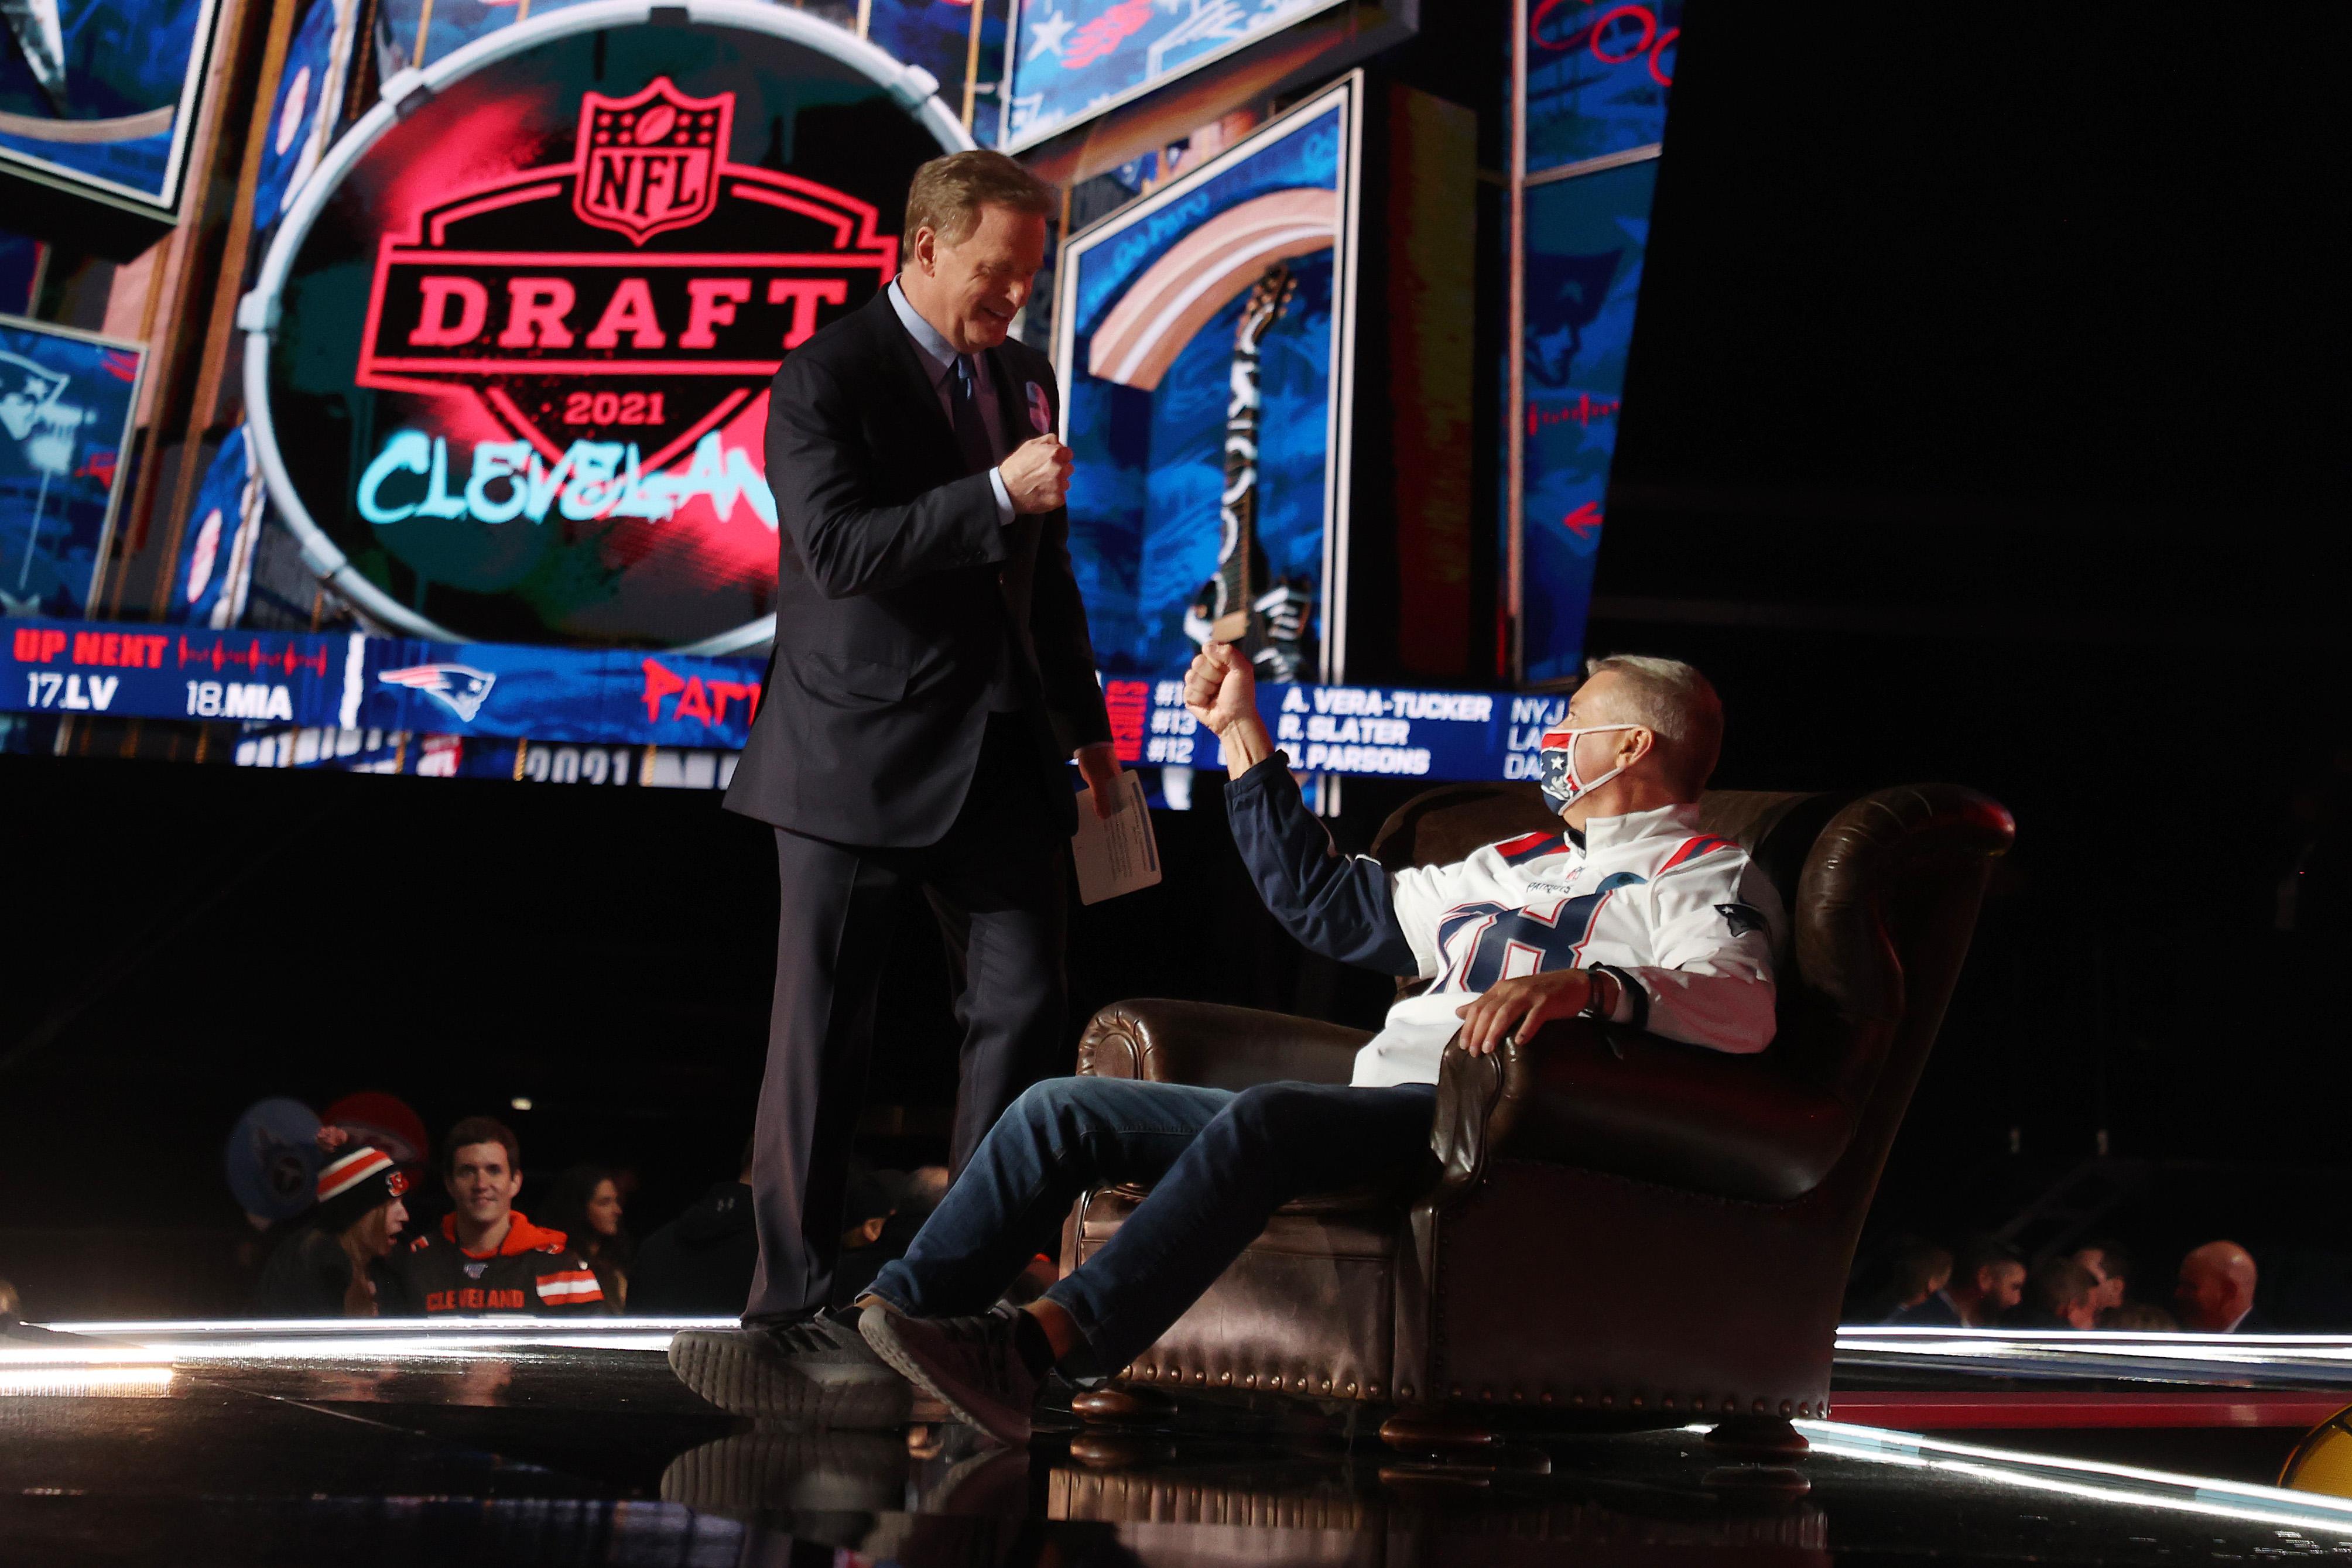 NFL专员Roger Goodell在2021年4月29日在俄亥俄州克利夫兰克利夫兰的2021年4月29日,在2021年NFL草案中,在2021年NFL选秀中迎接风扇。